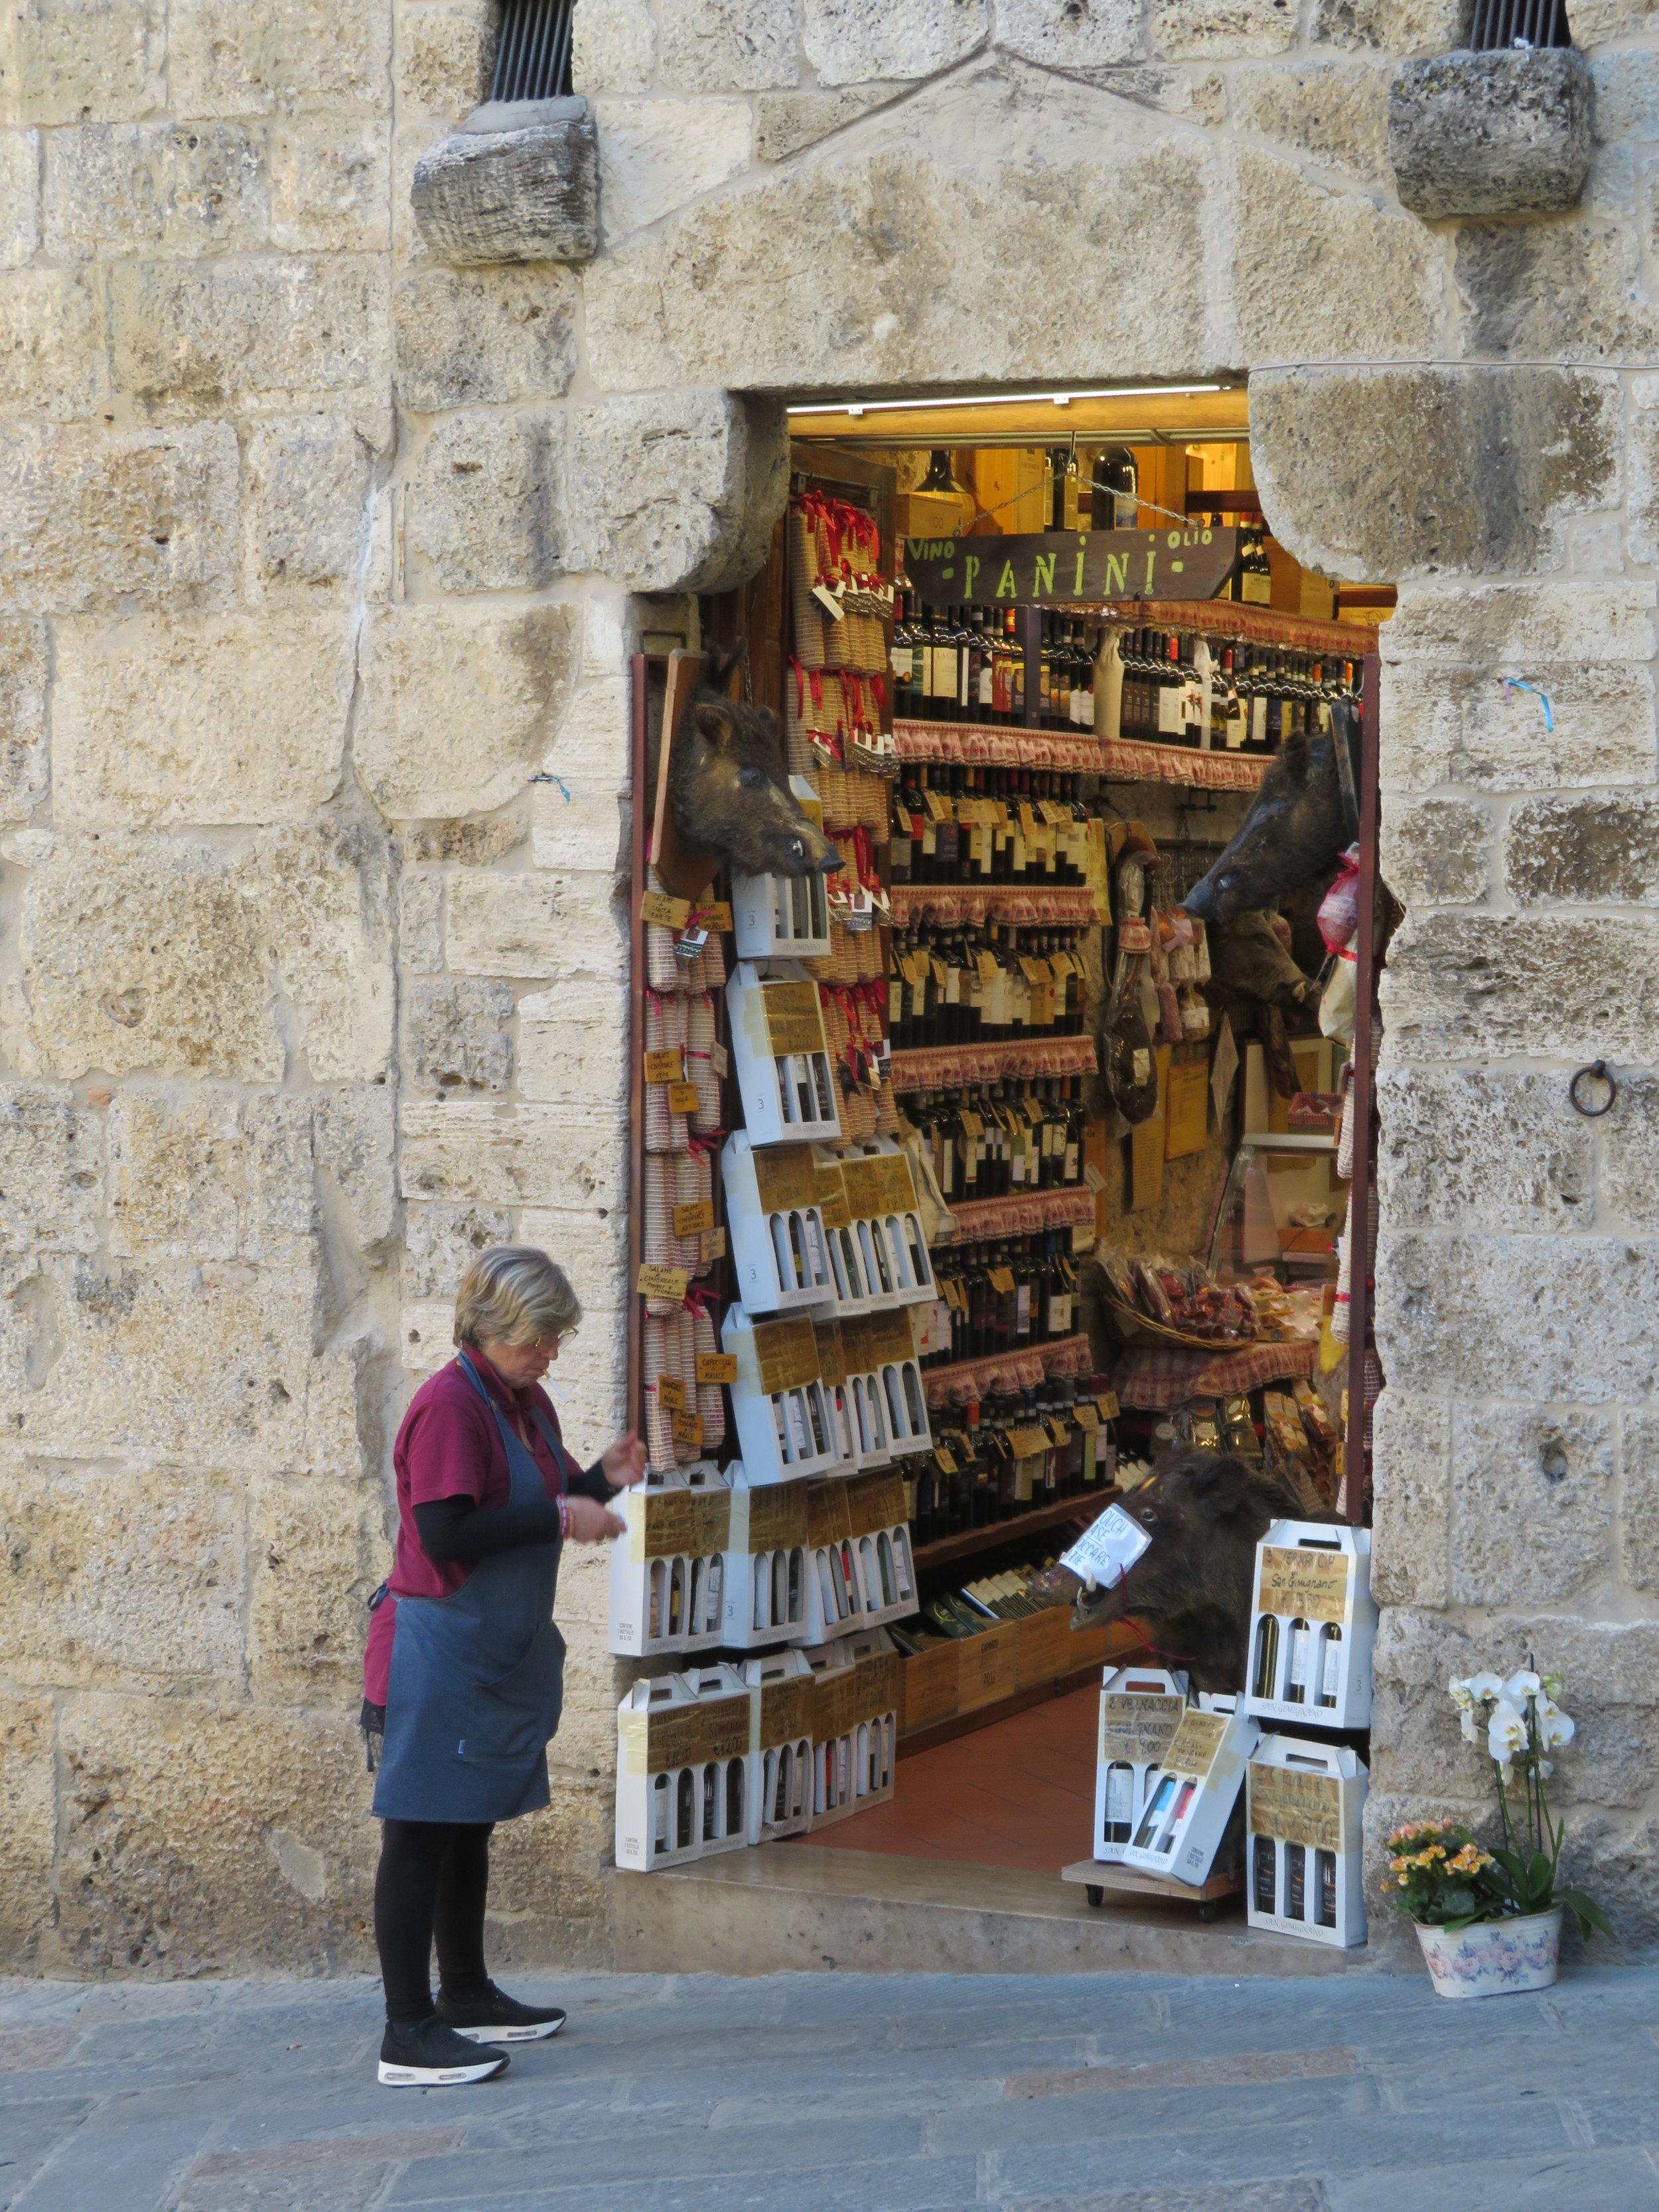 A fine wine shop